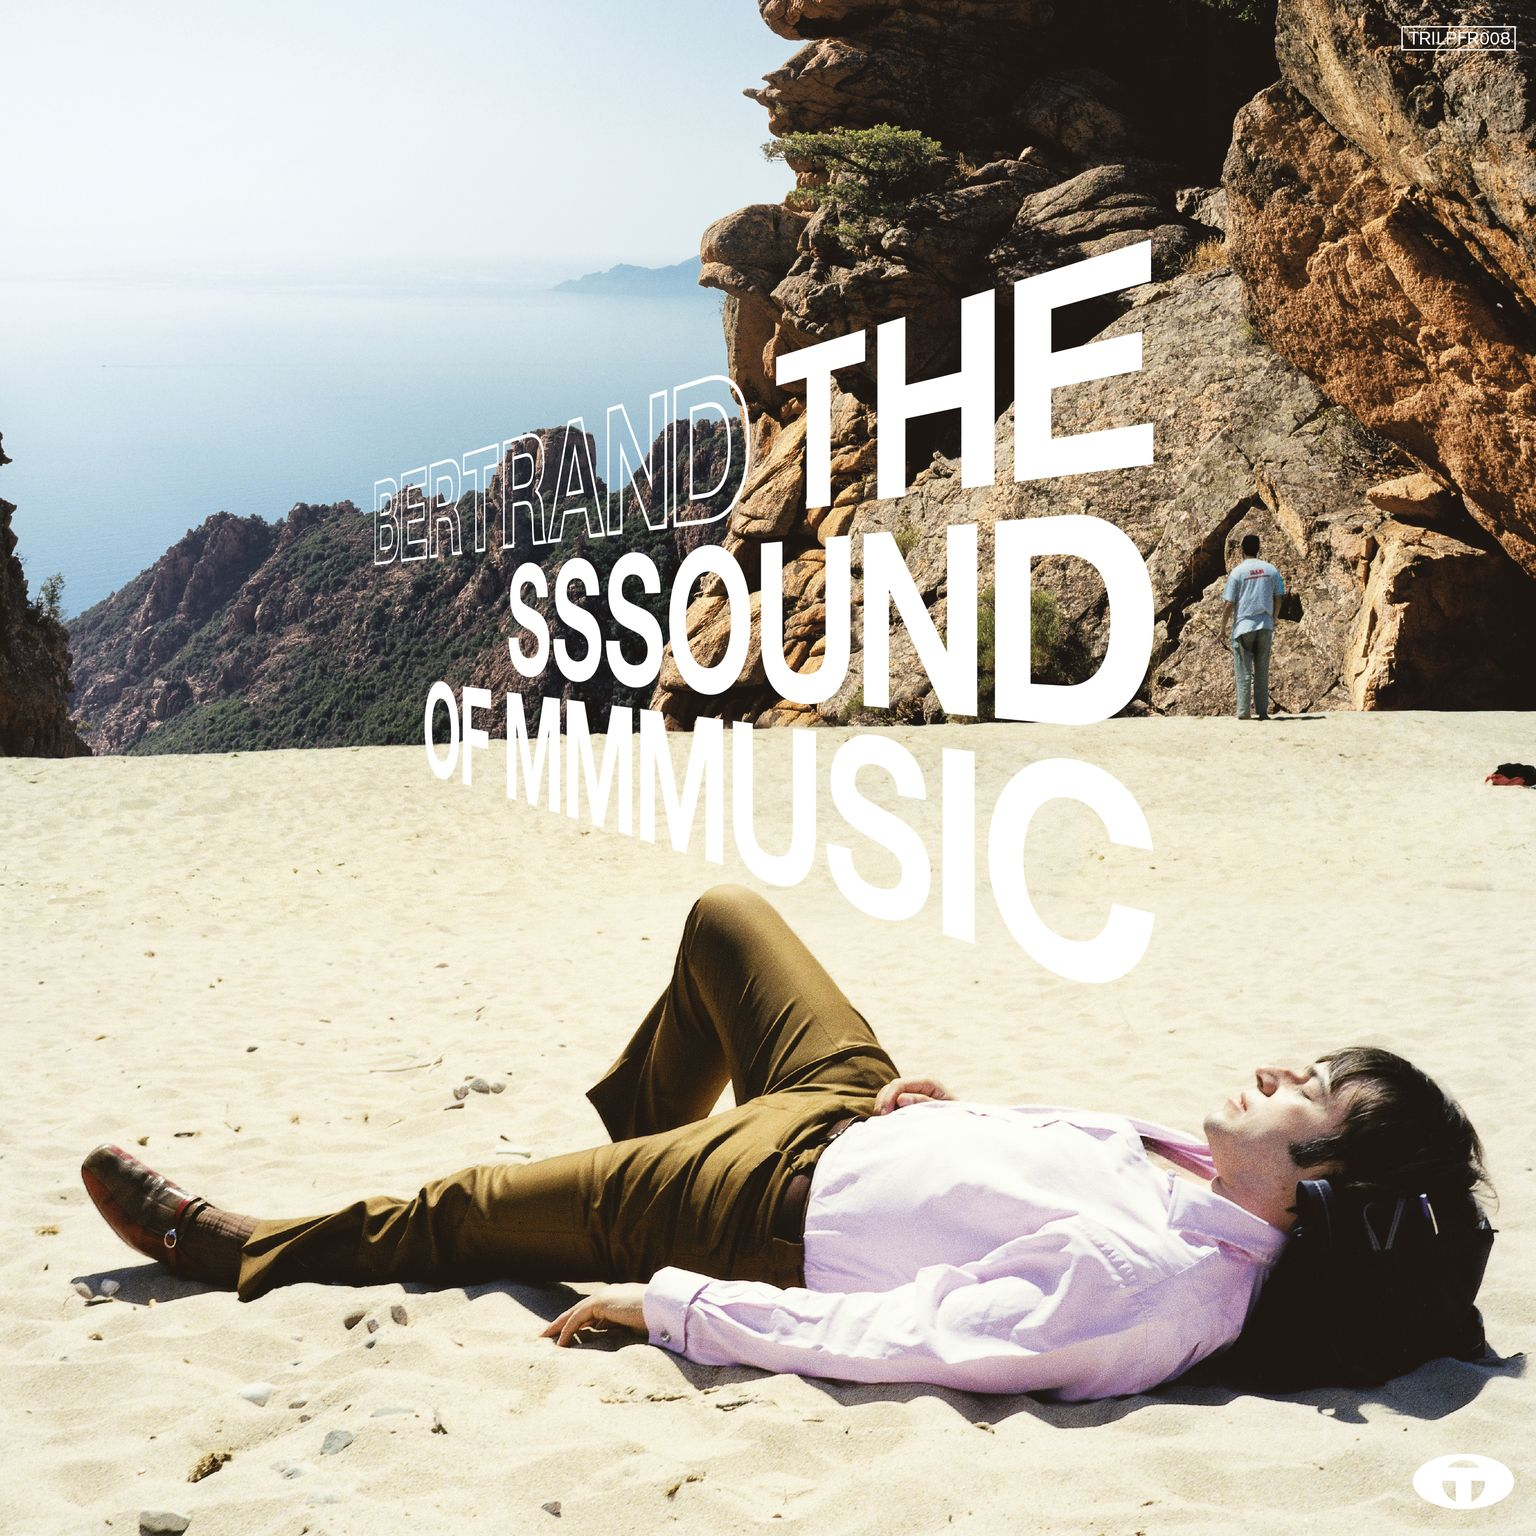 Bertrand Burgalat - The Sssound of Mmmusic - Disquaire Day